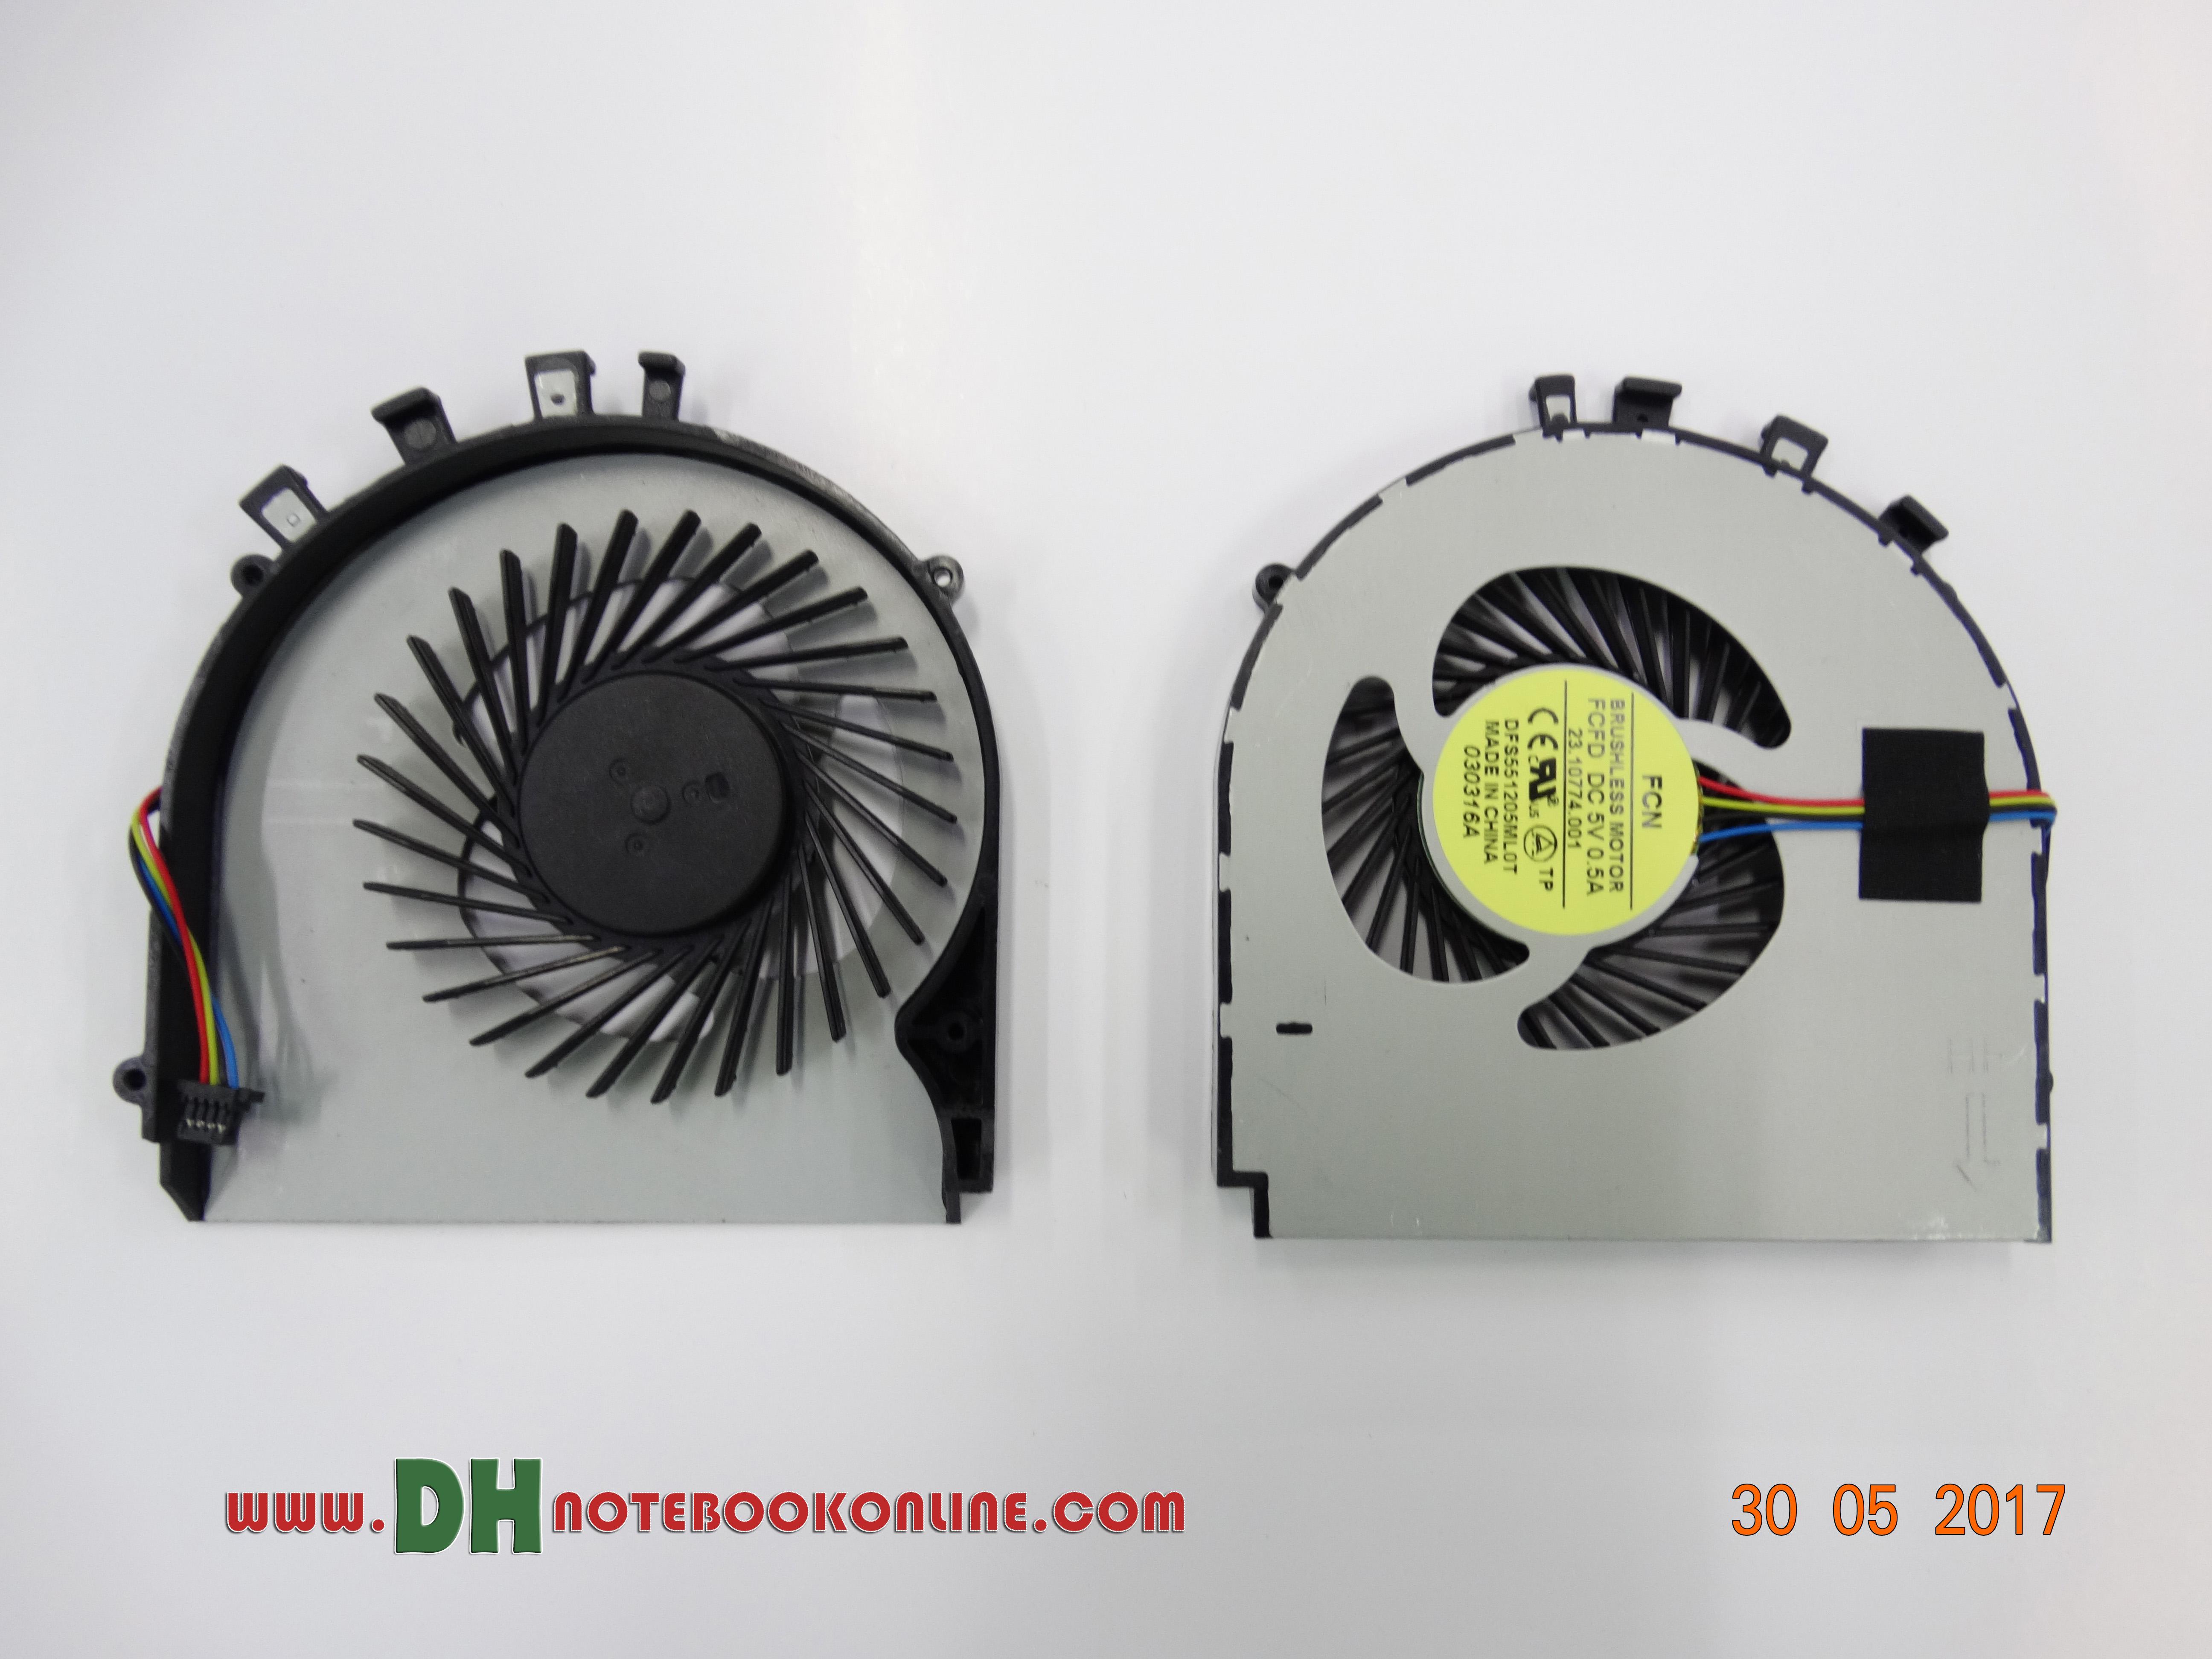 Asus K450 cooling fan